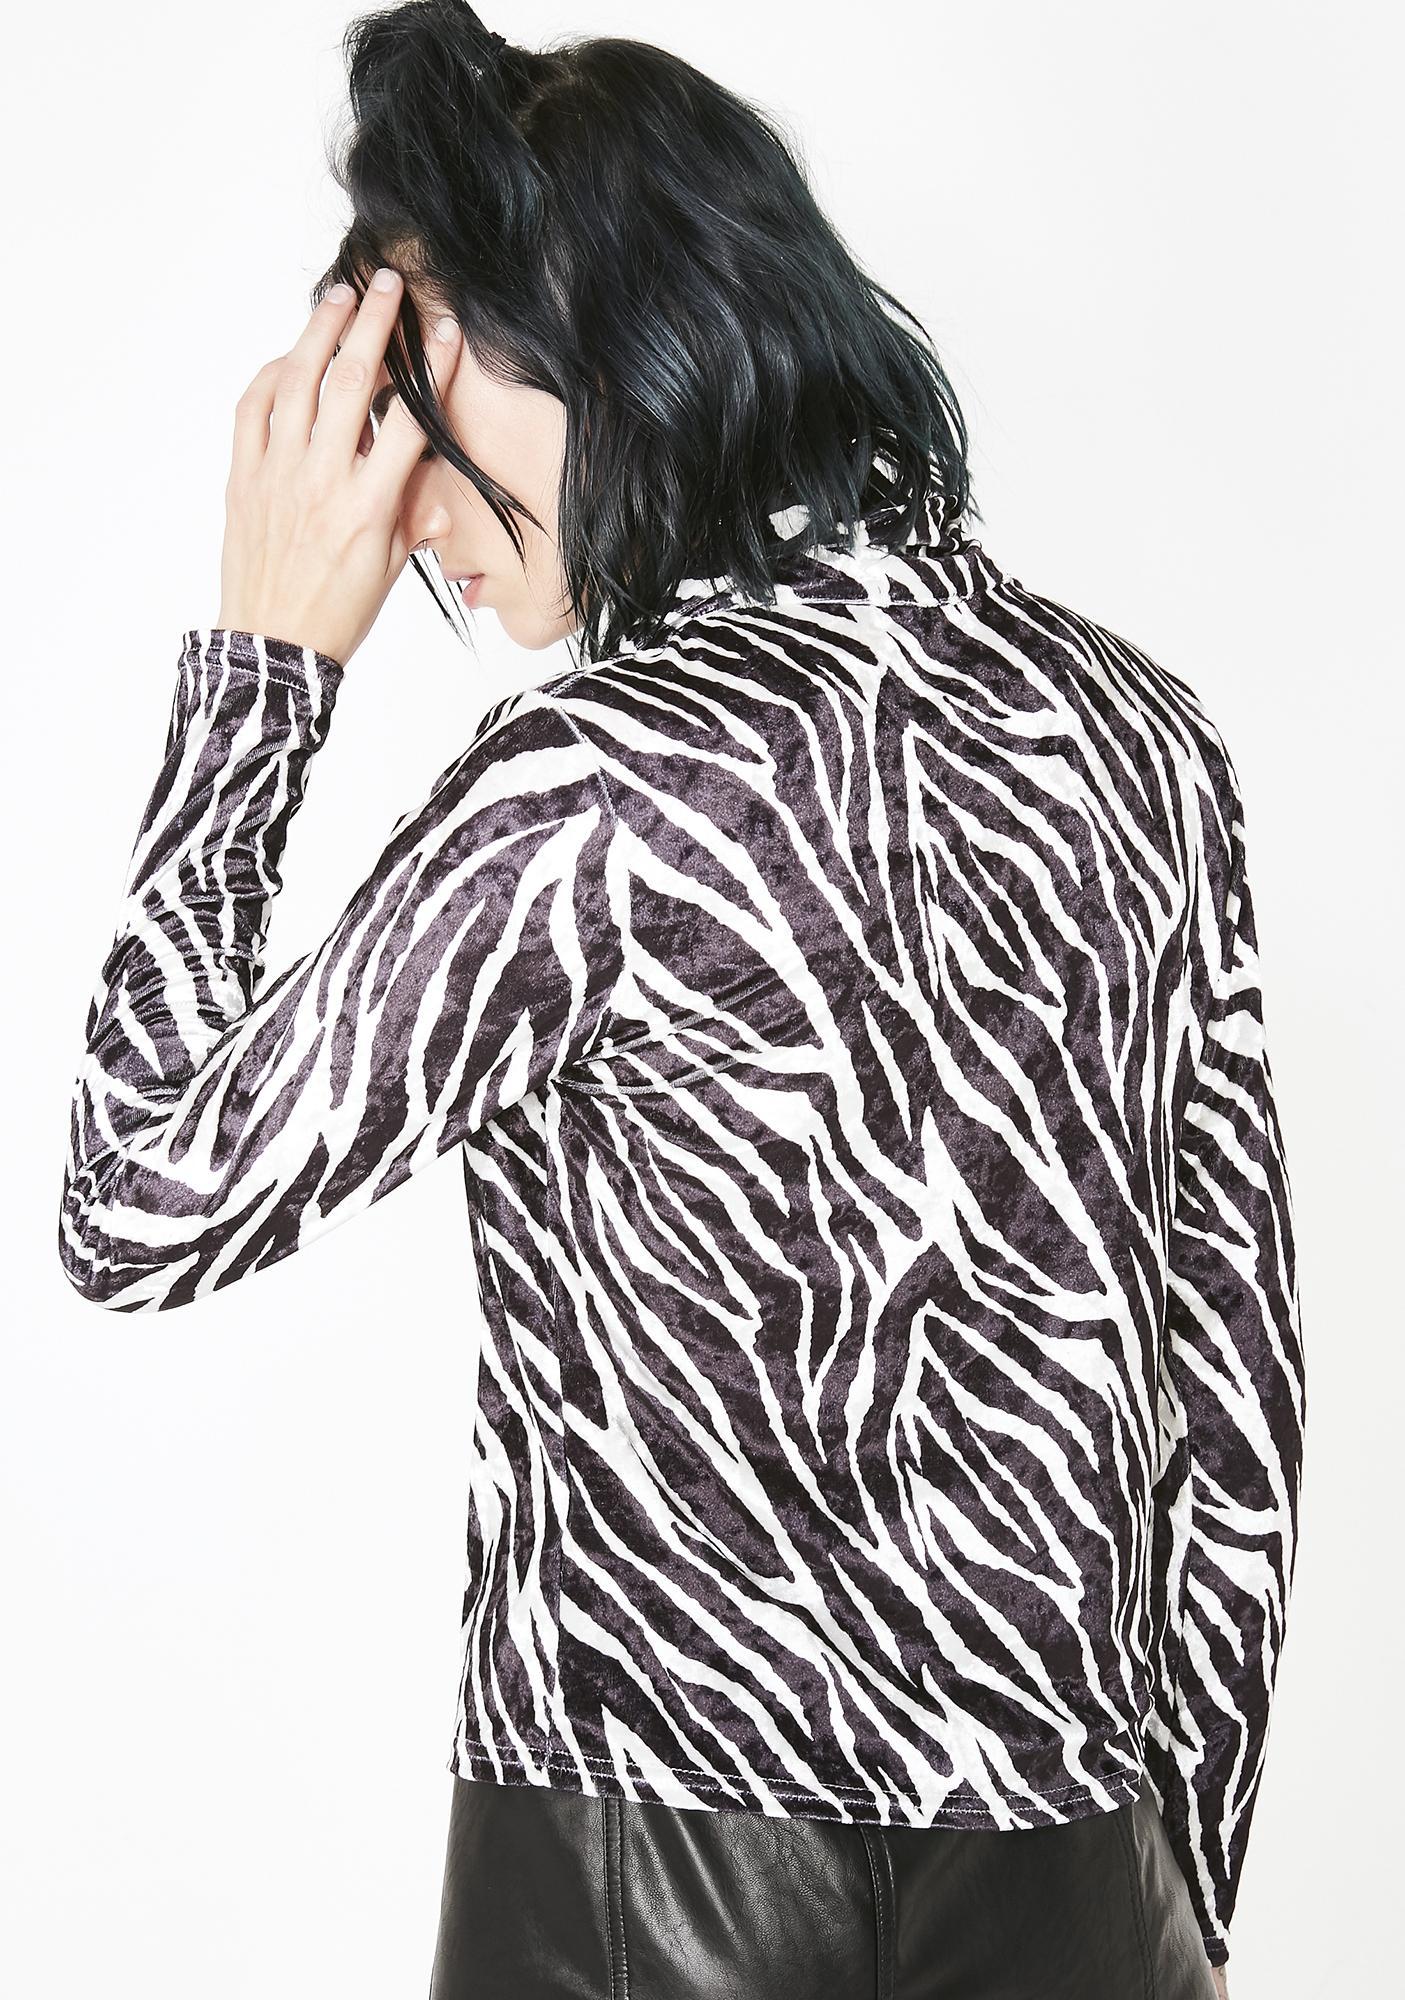 Current Mood Unruly Behavior Zebra Top